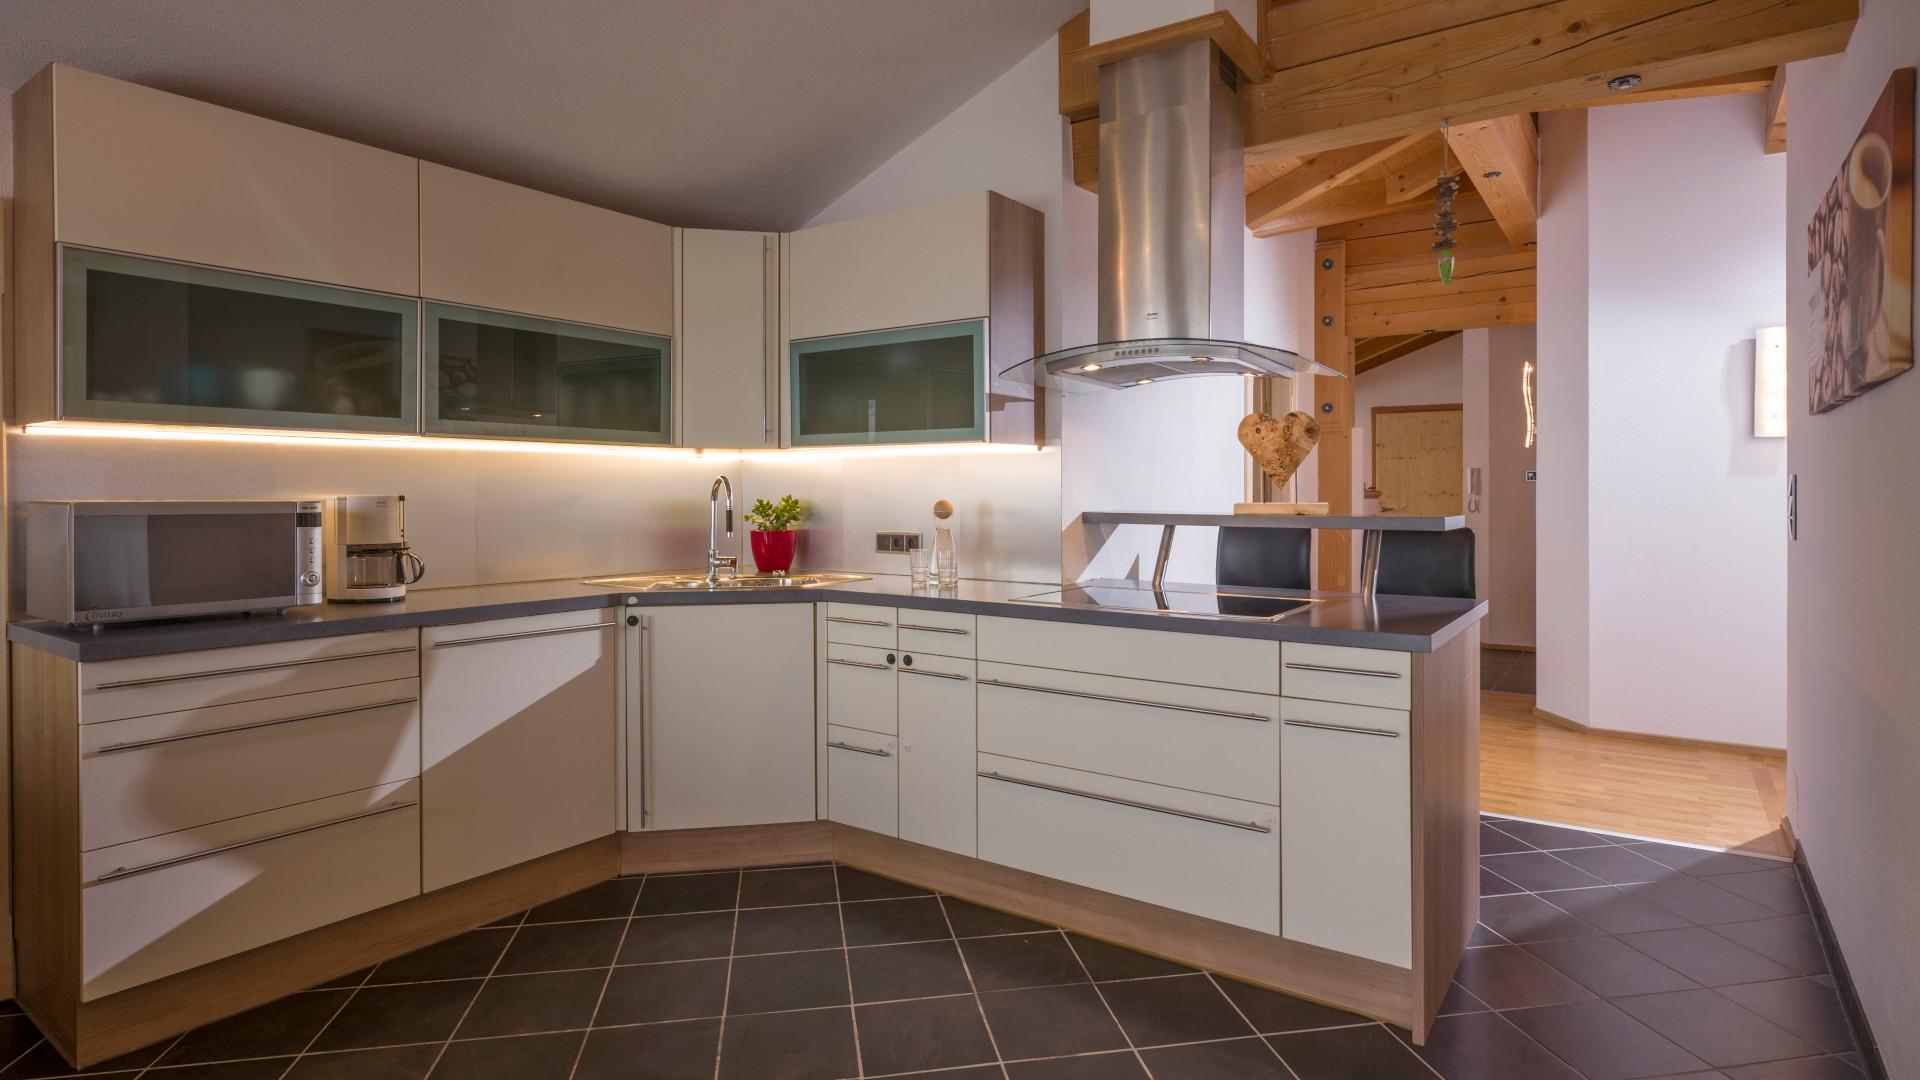 Panoramablick Küche 1920×1080